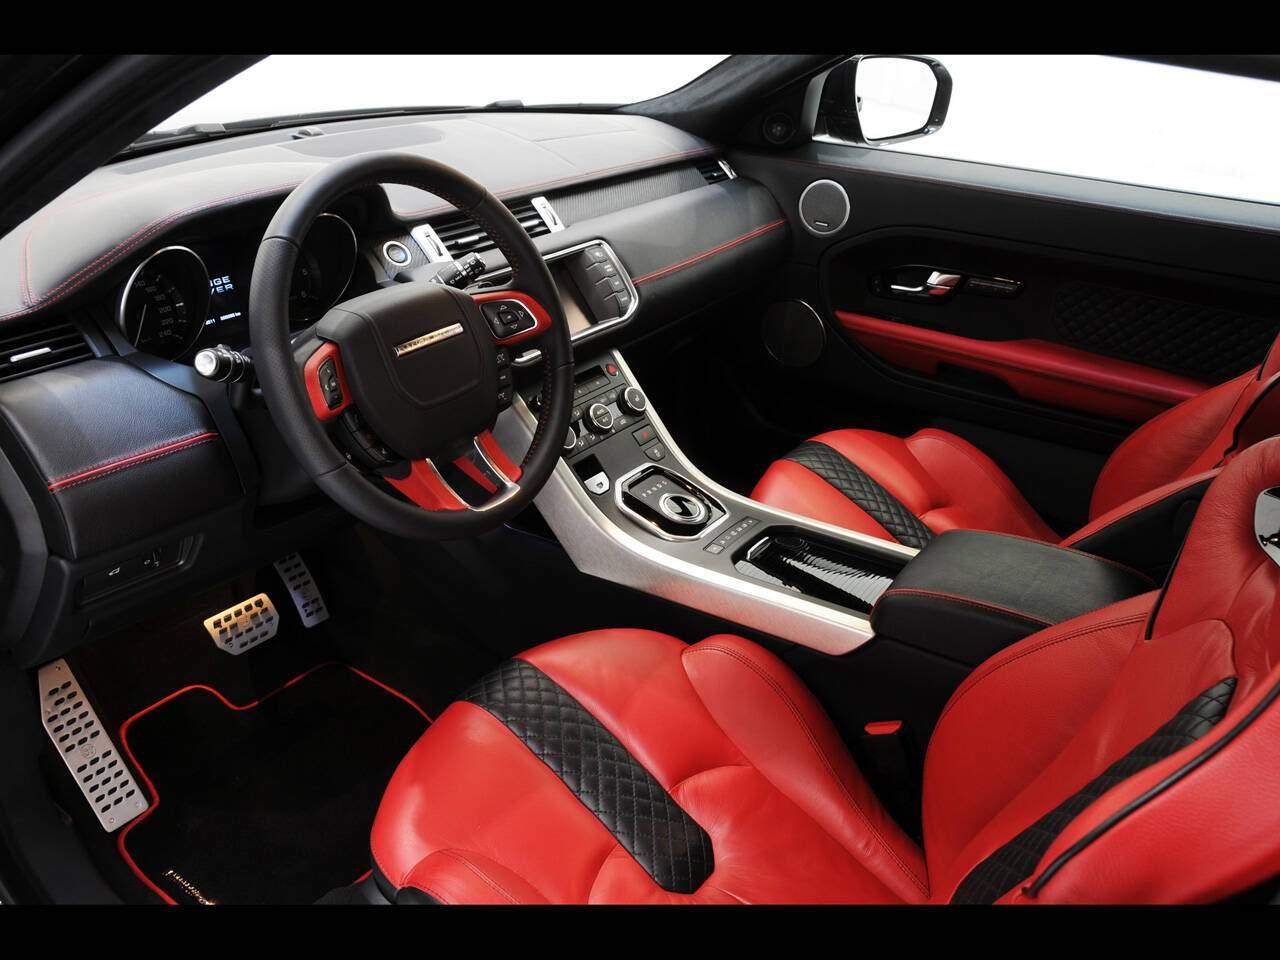 Startech Range Rover Evoque (2012),  ajouté par fox58